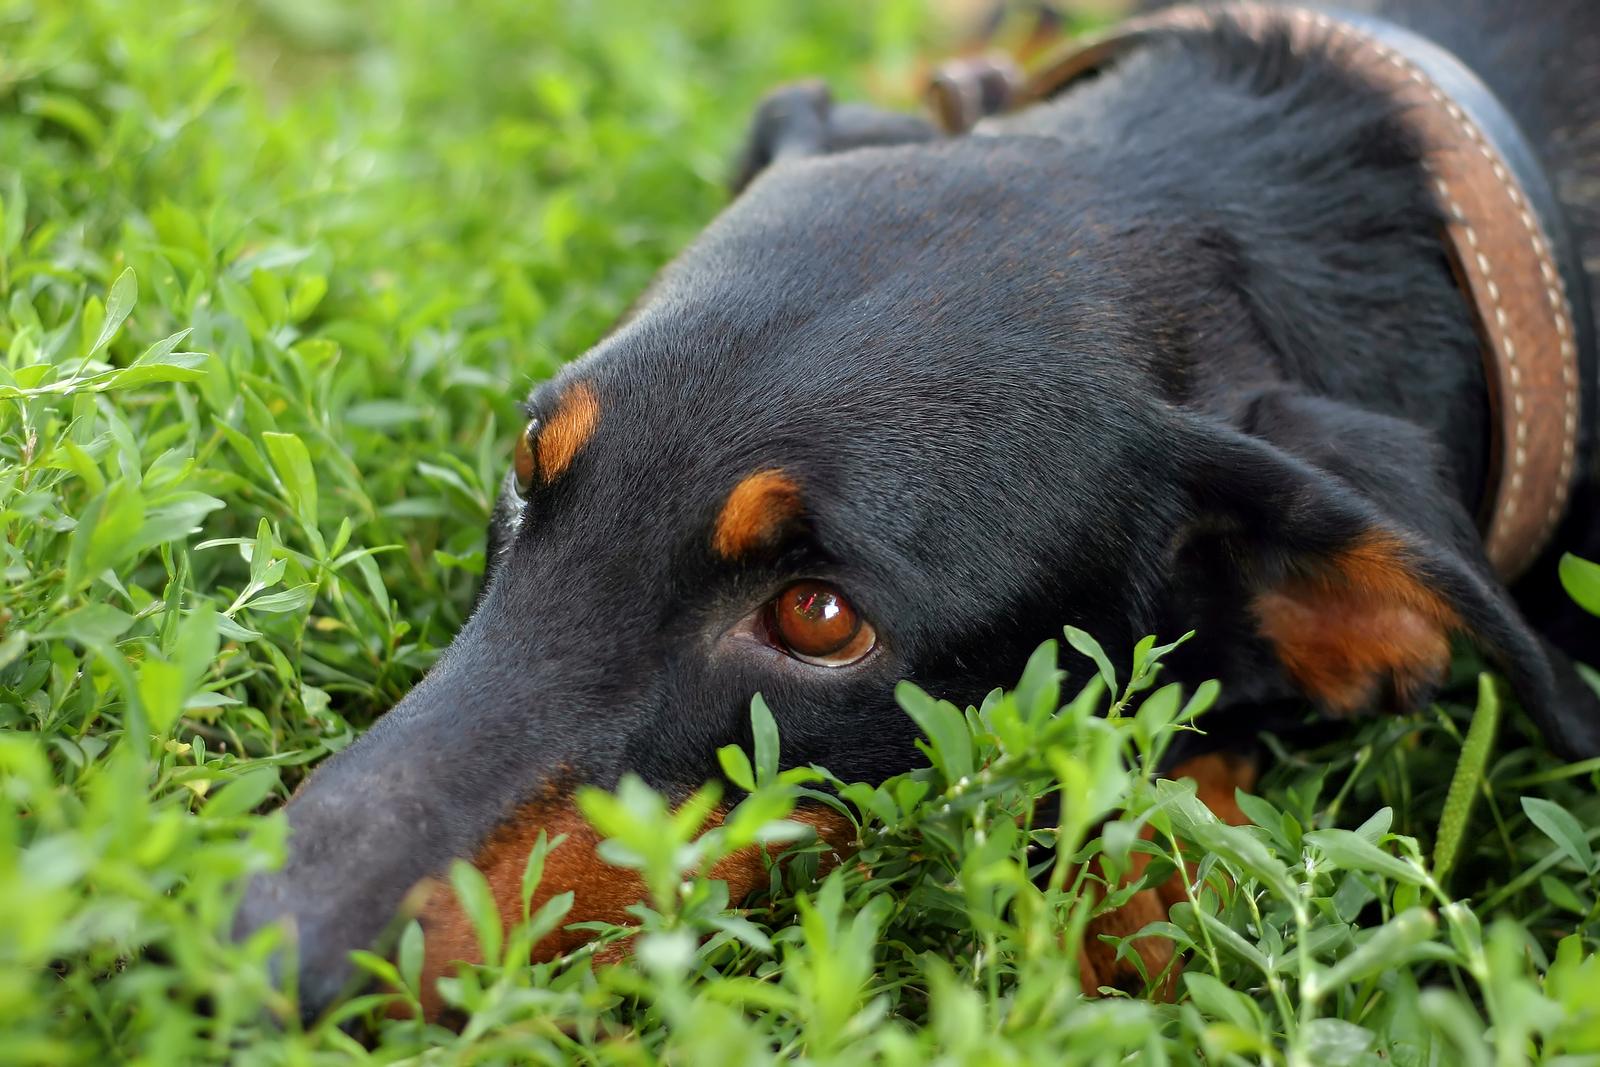 tvrh triangle veterinary referral hospital trianglevrh bigstock-dog-gaze-26266277.jpg